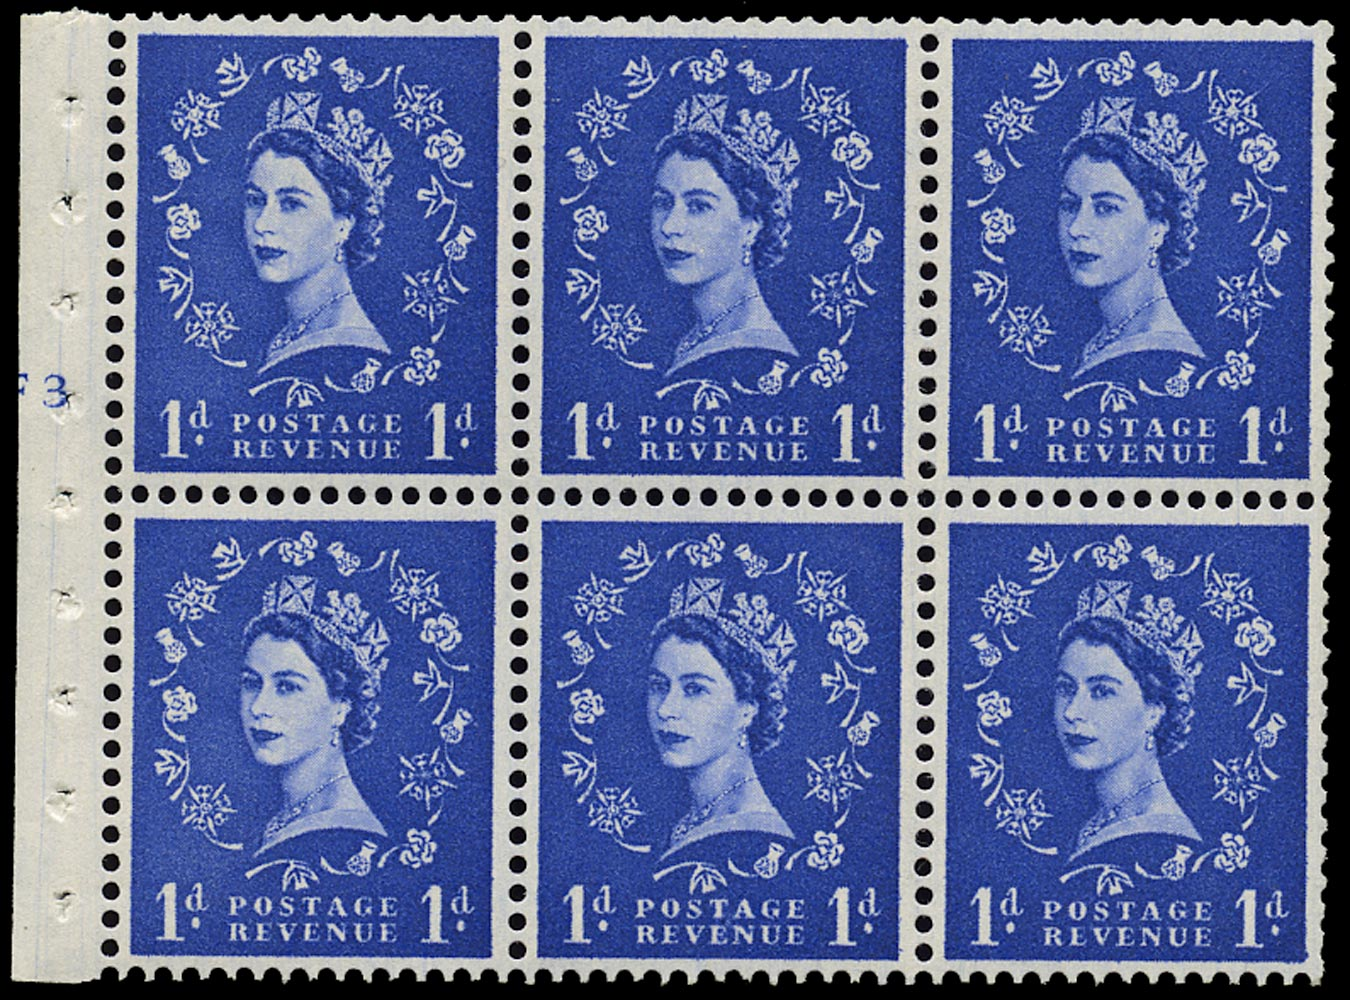 GB 1958  SG571l Booklet pane F3(T) no dot